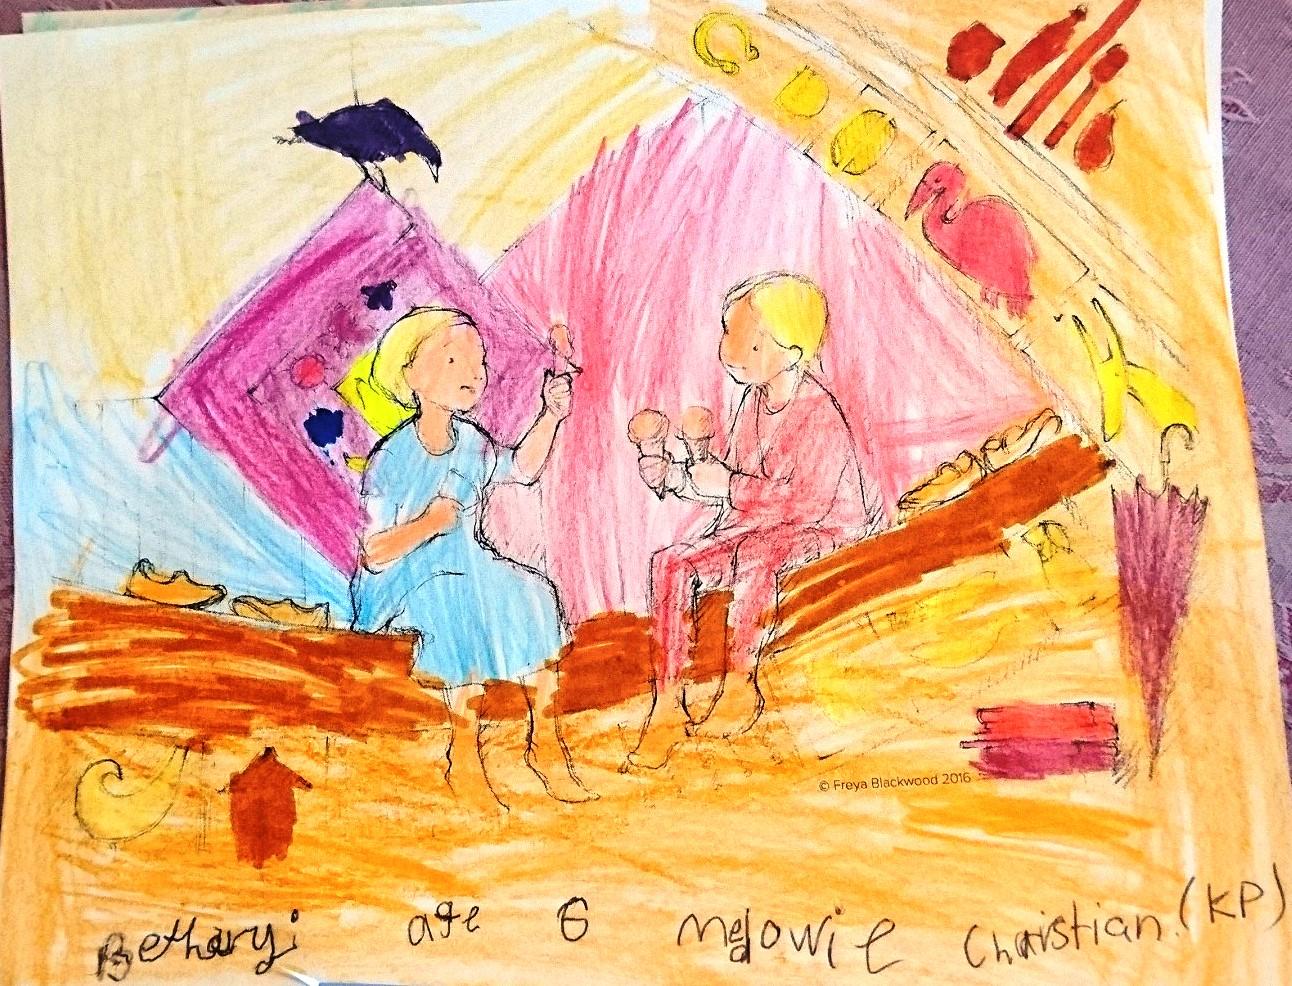 Bethany G, age 6, Medowie Christian School, NSW.